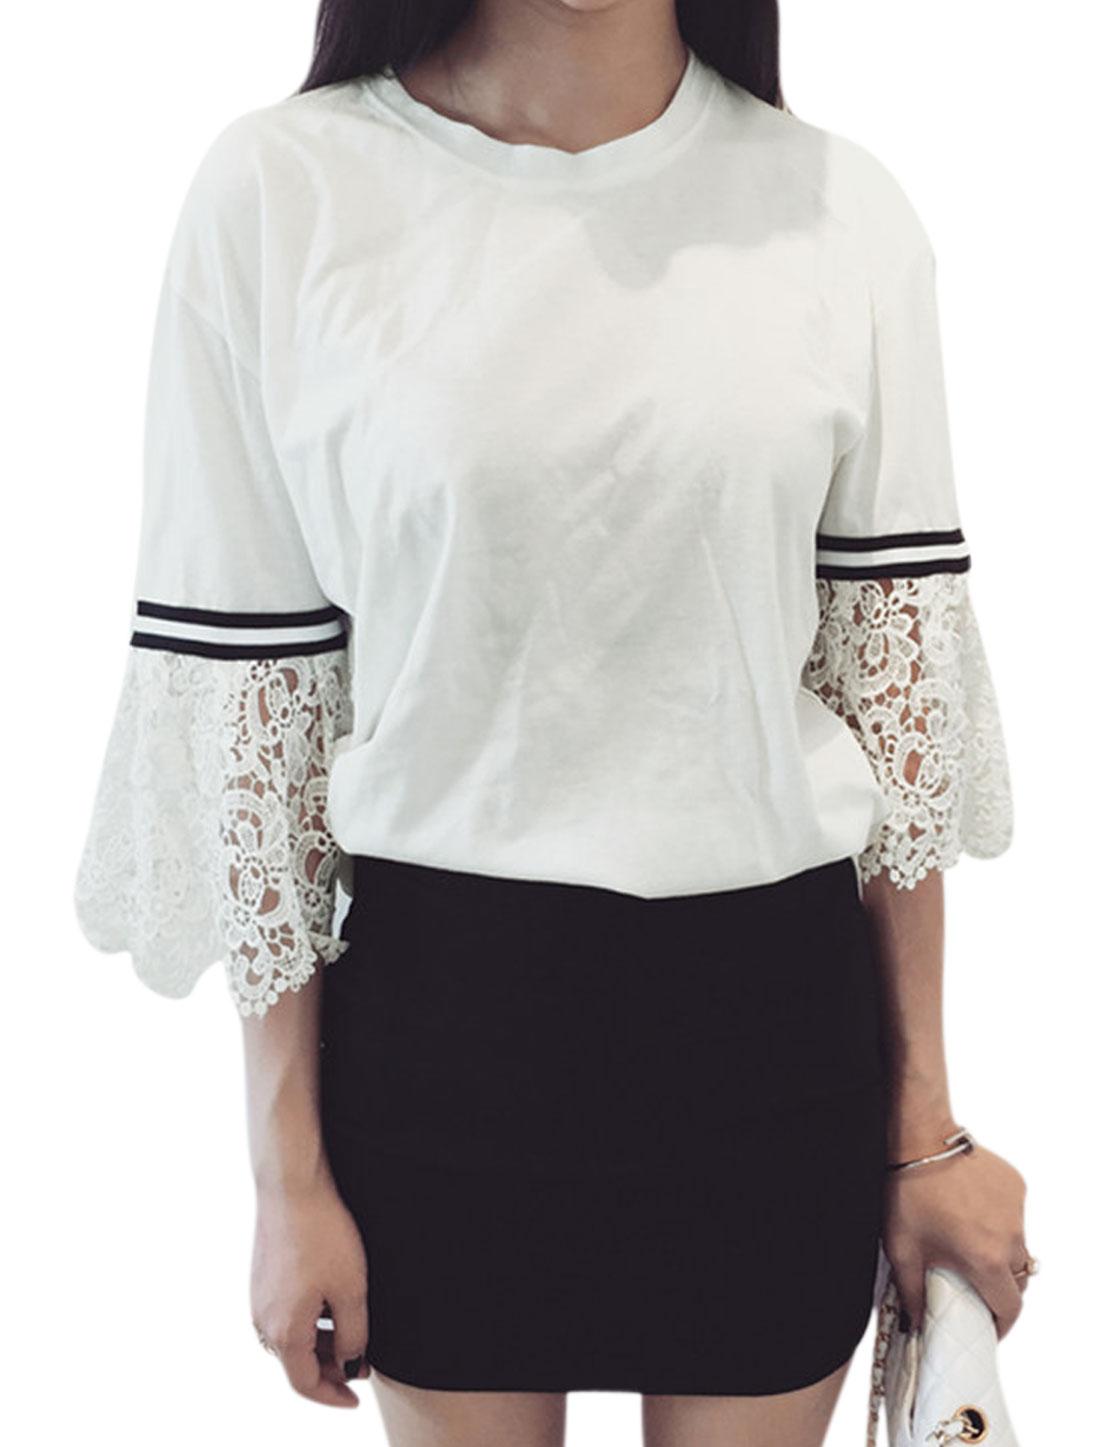 Women Crew Neck 3/4 Bell Sleeves Panel Design Shirt White XS